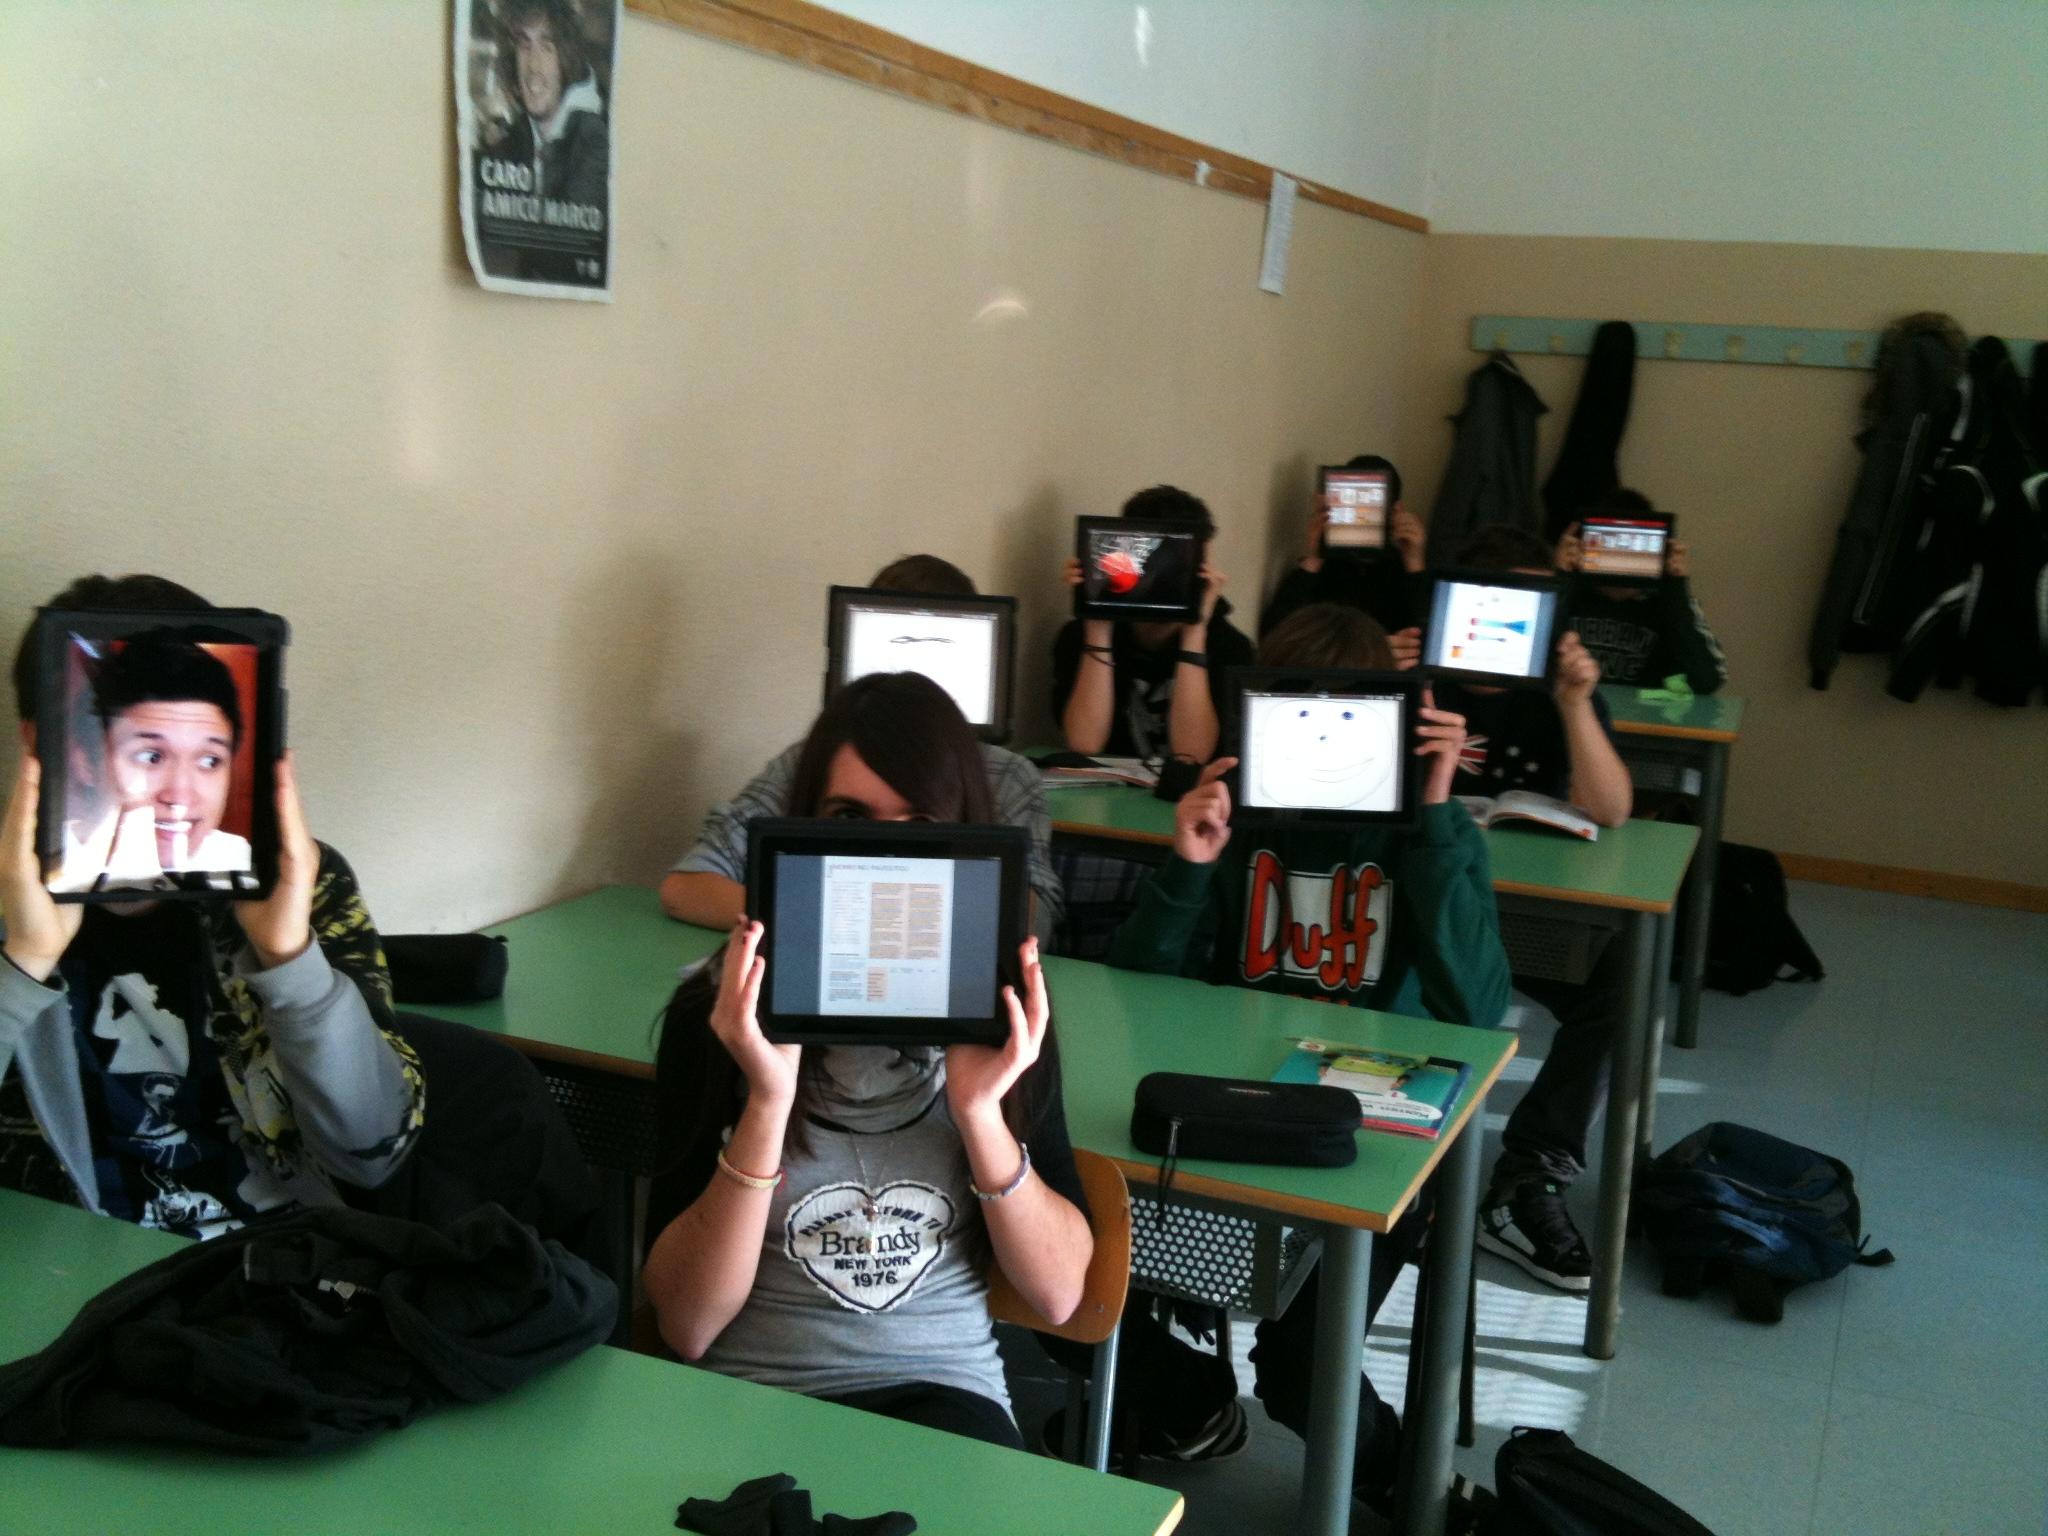 Giovani nativi digitali